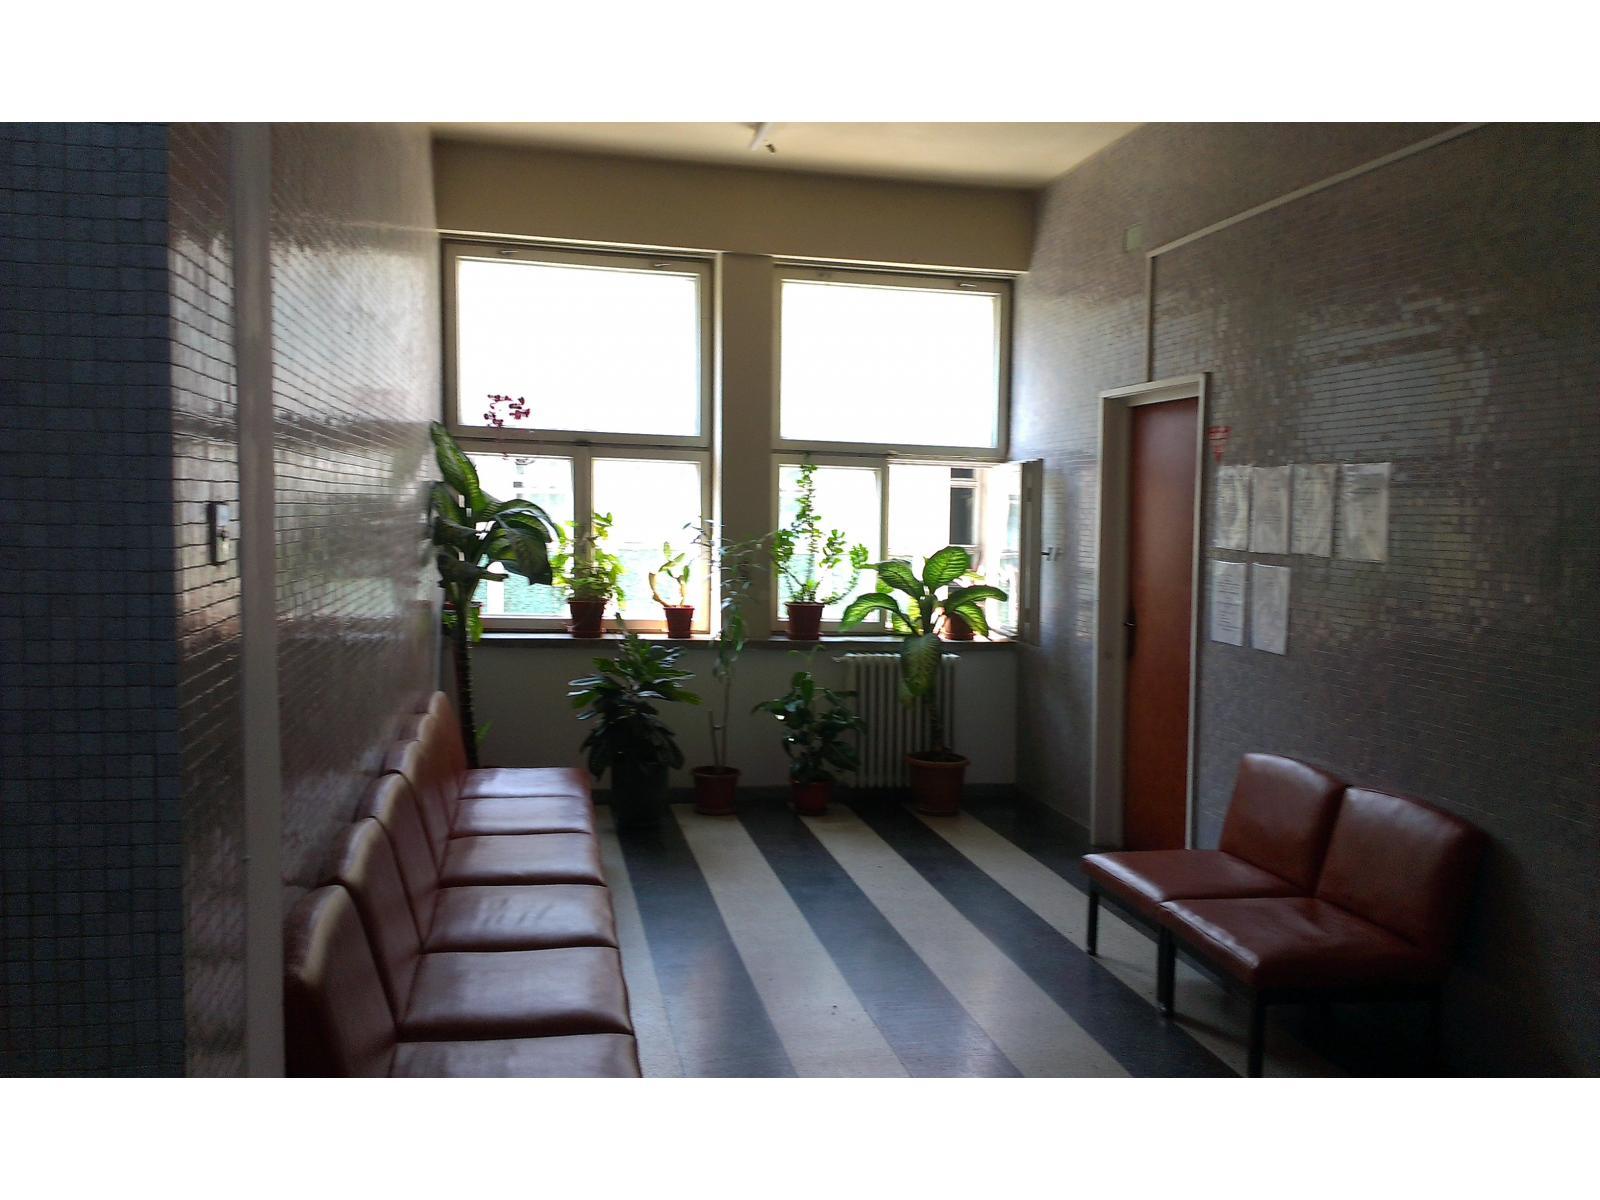 CENTRUL MEDICAL PRAIN SRL - SALA_ASTEPTARE_SPITAL_PRAIN.jpg